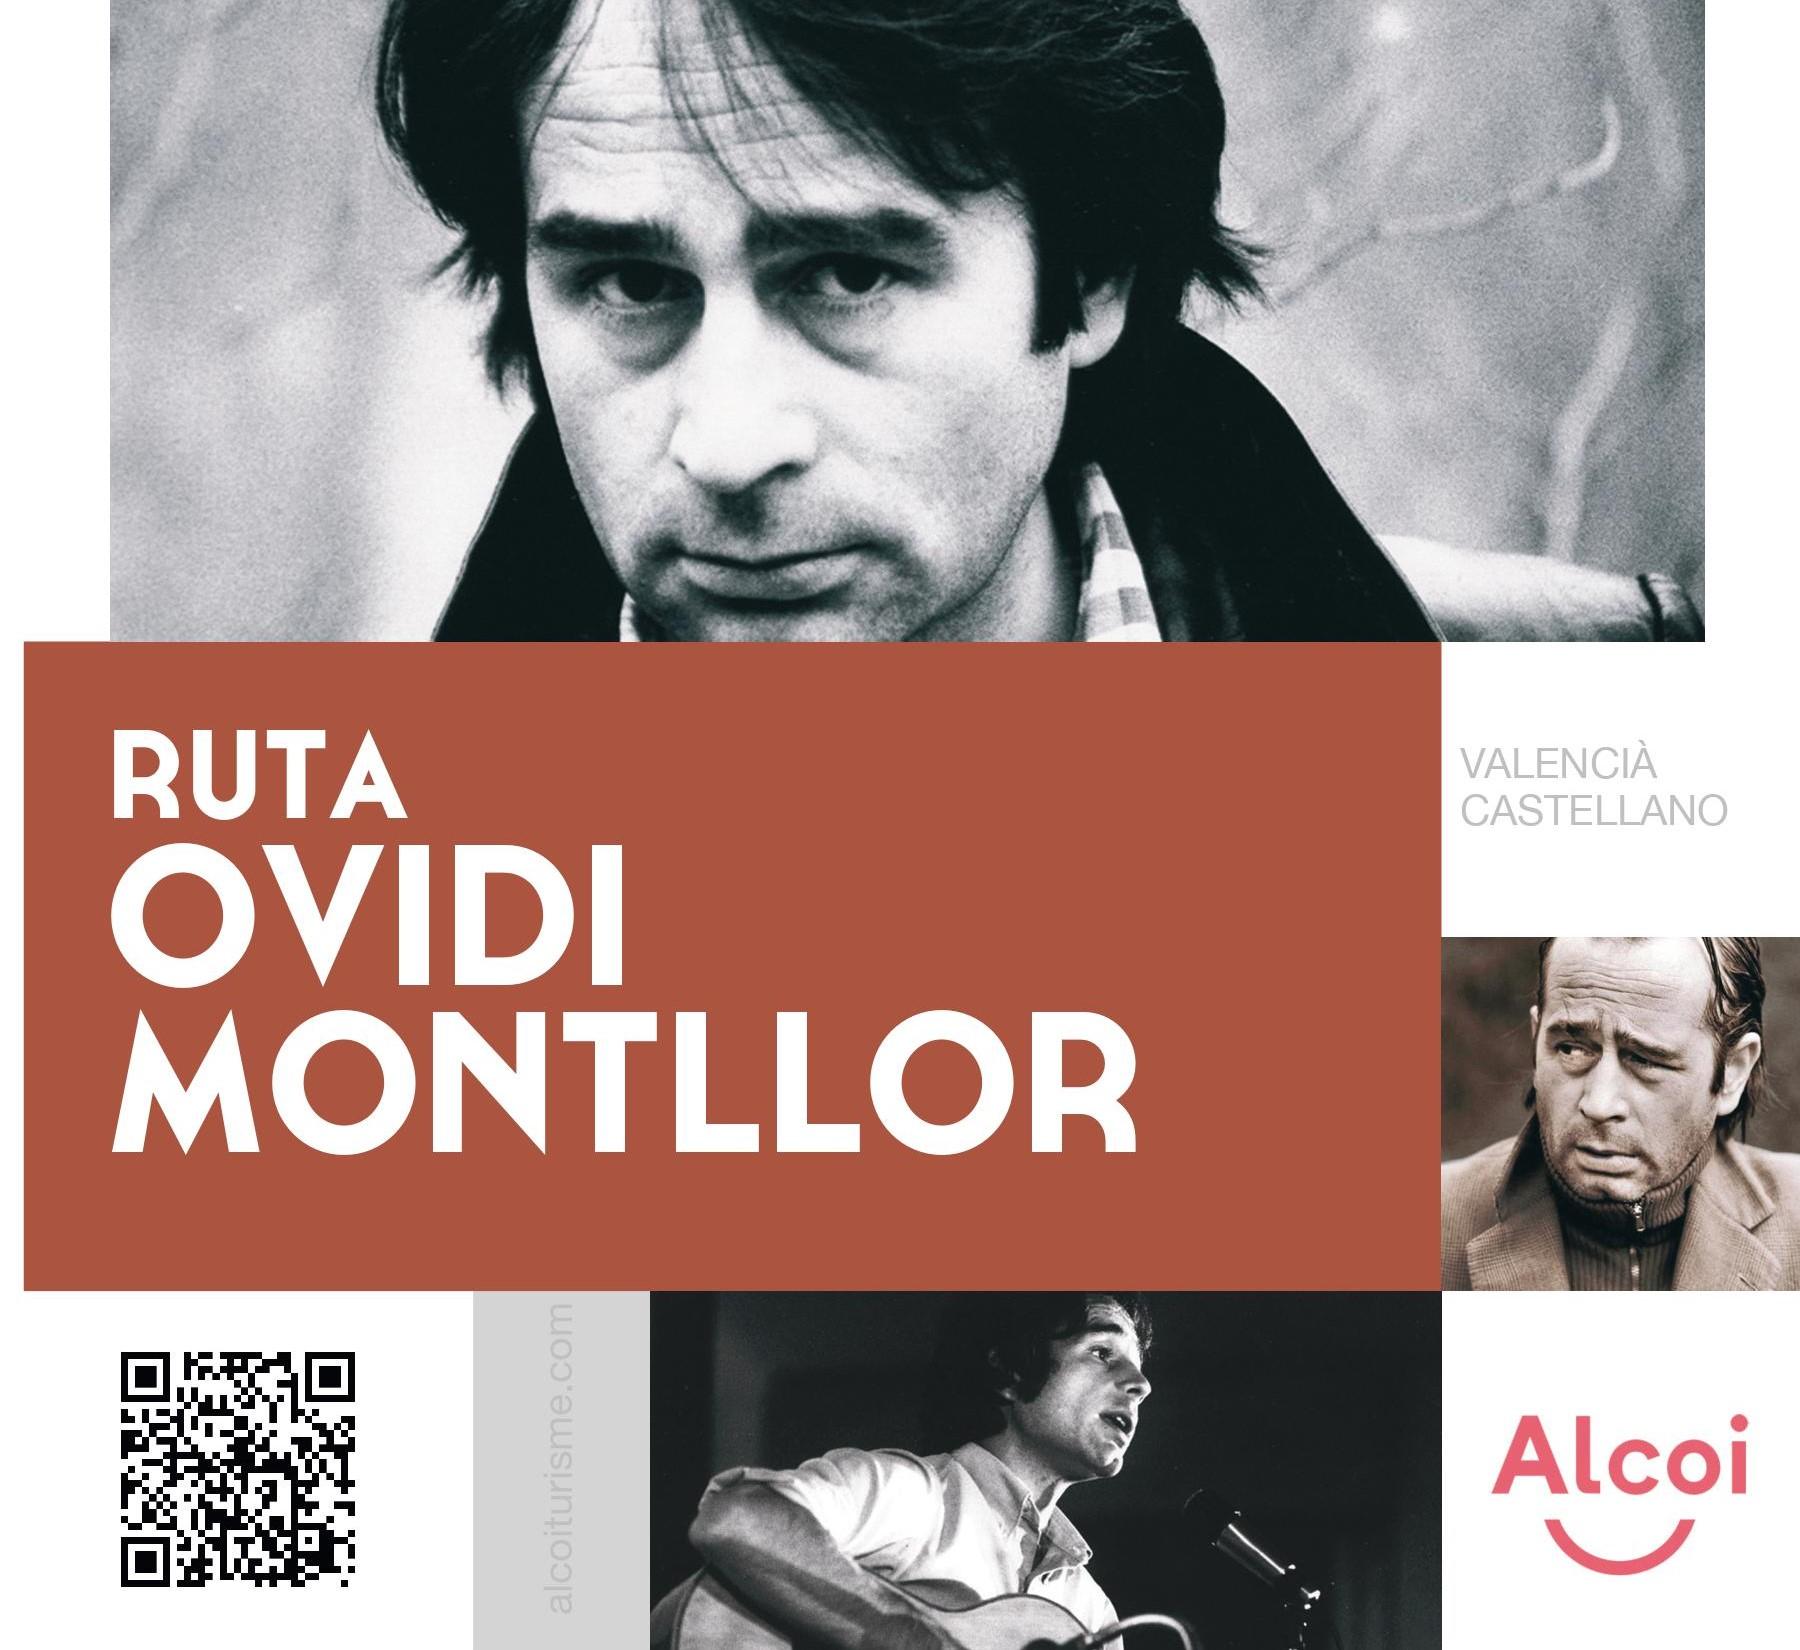 Imagen folleto Ovidi Montllor